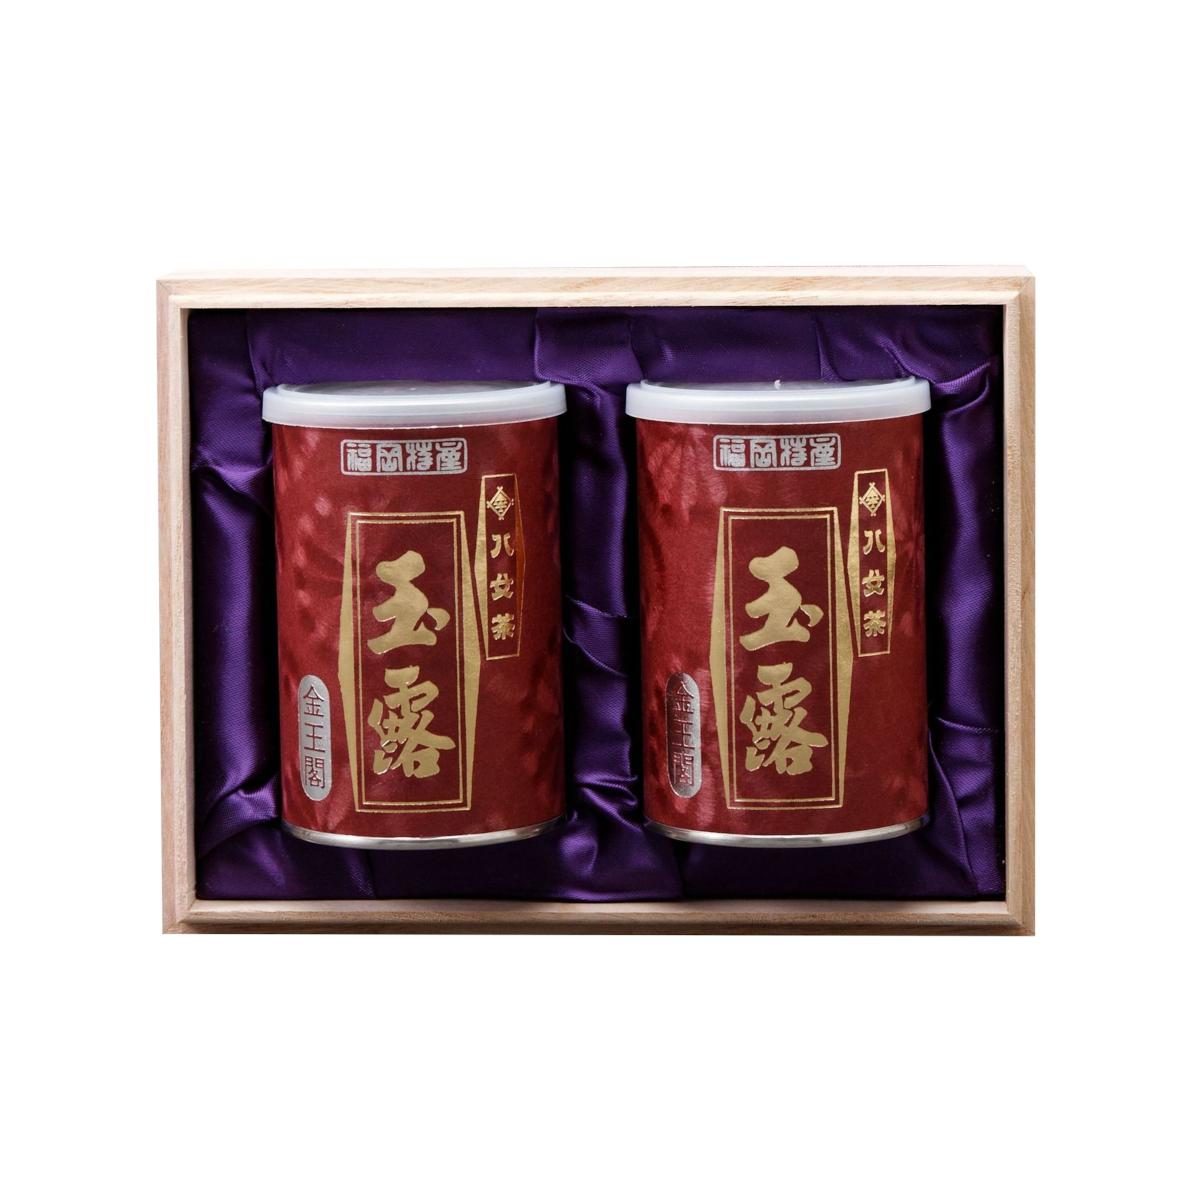 【G-256・ル】玉露金王閣 100g×2缶木箱ギフト